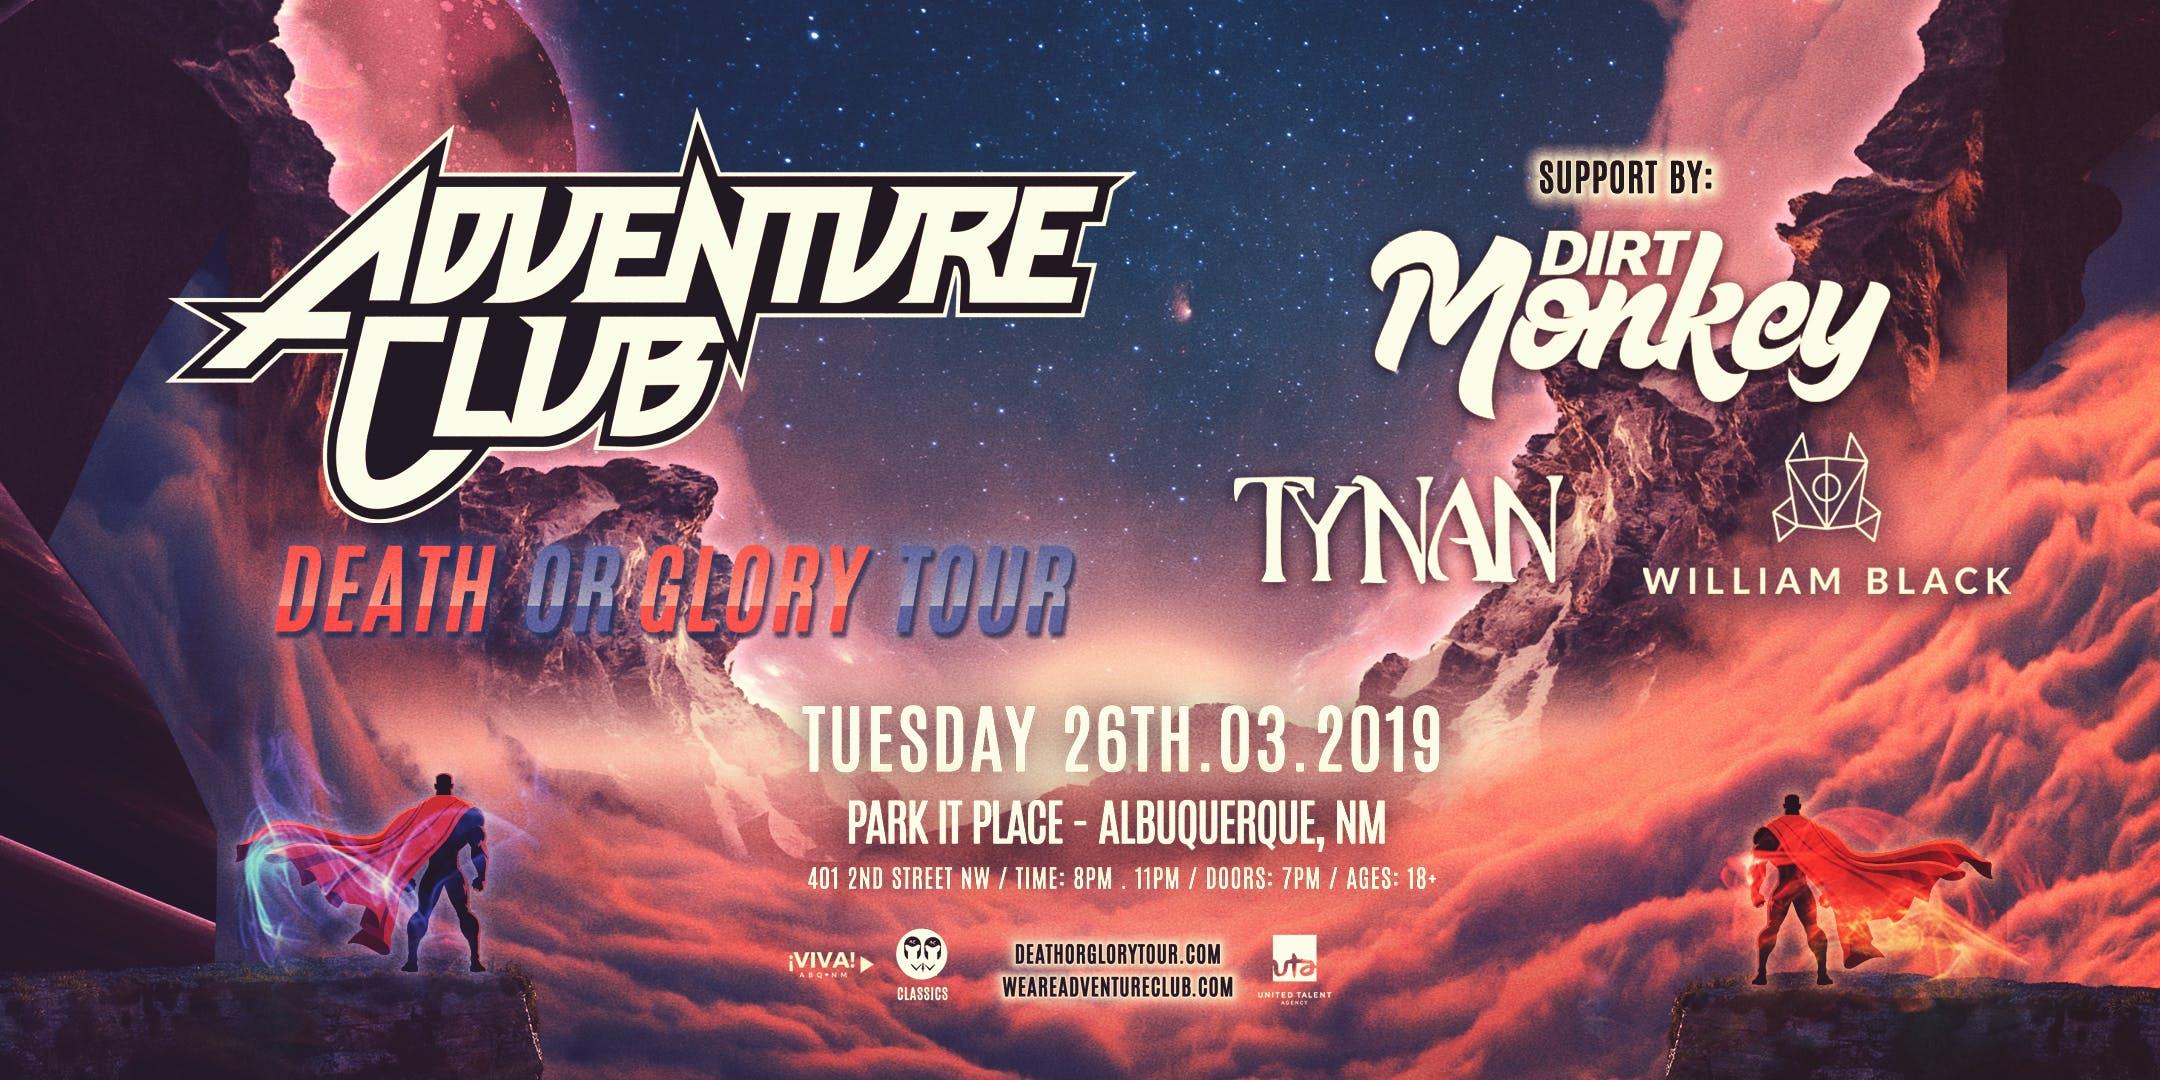 Adventure Club  Death or Glory Tour d562f7f3a3